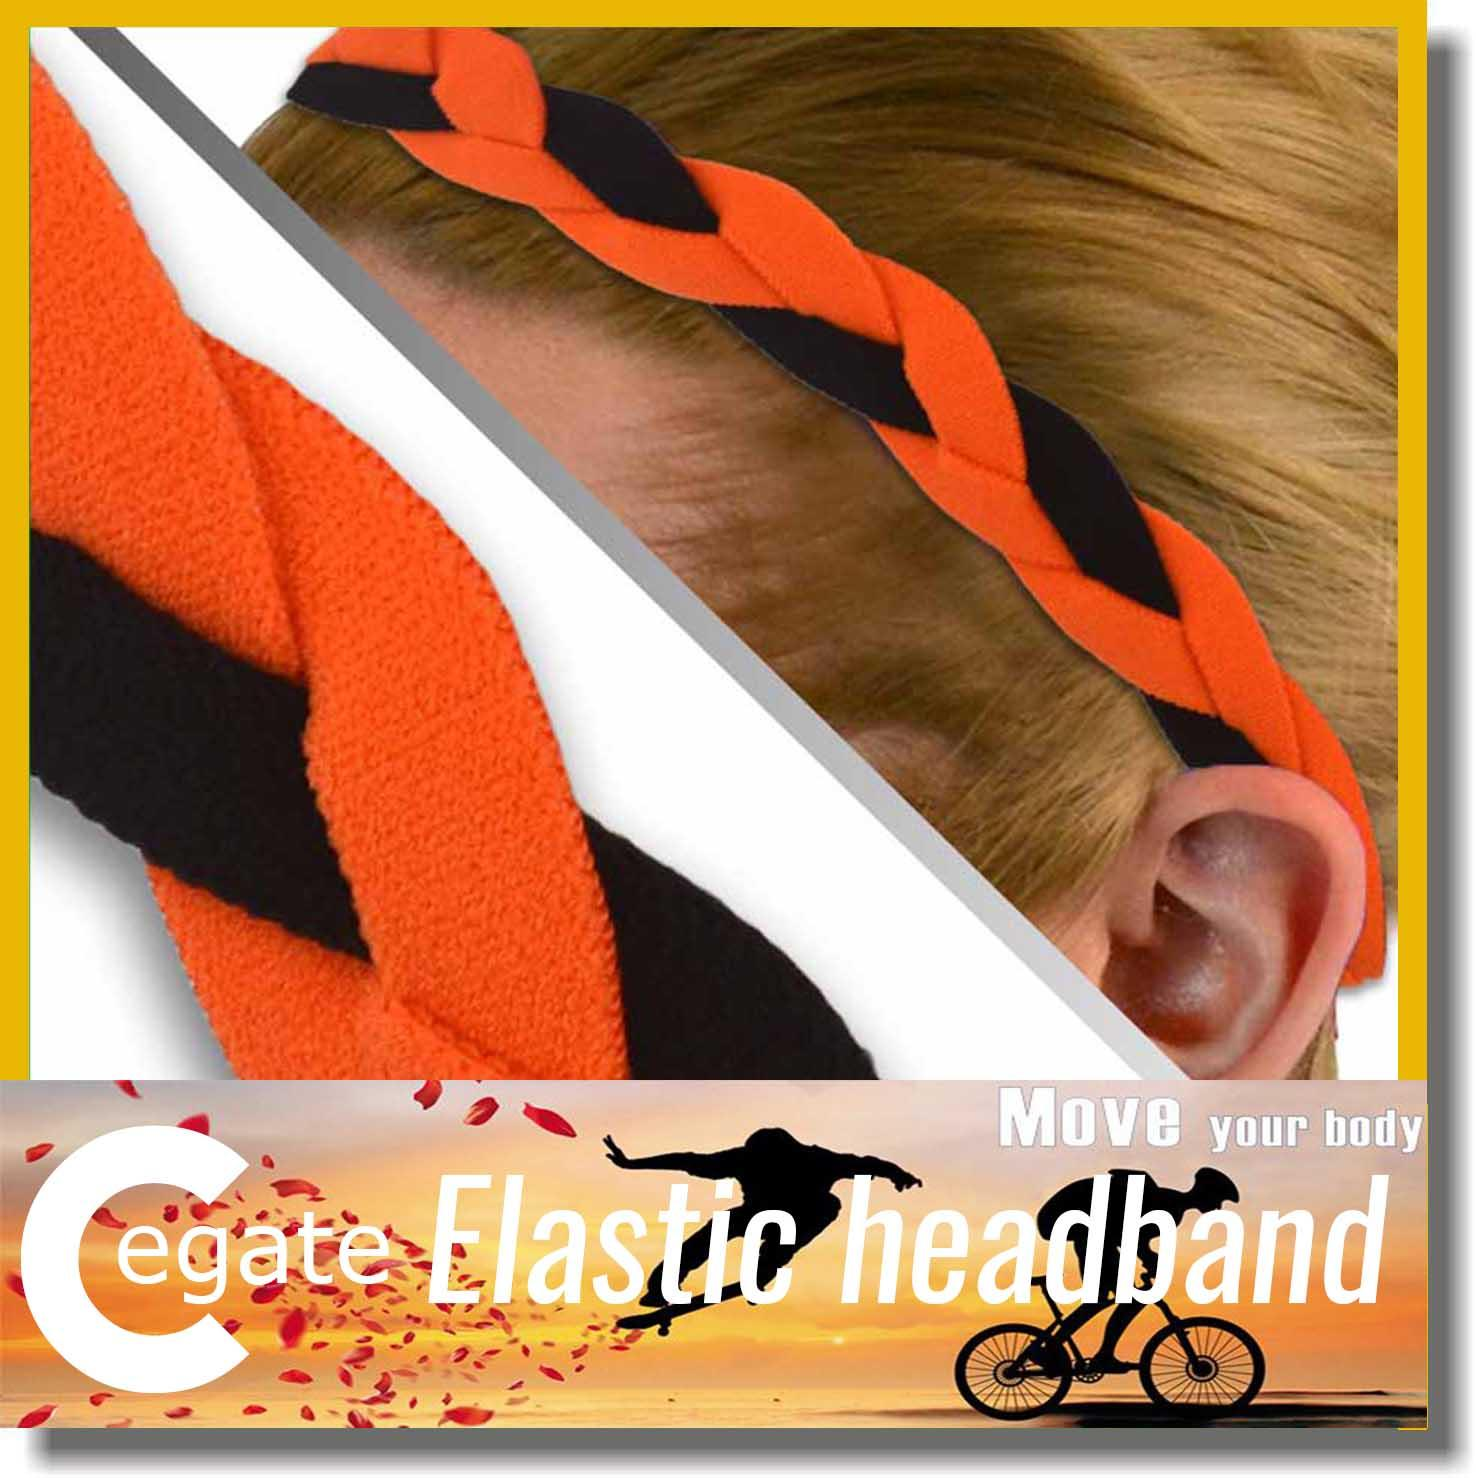 WHOLESALE 2016 Hot sale braided headbands sports headbands mini softball headband free shipping